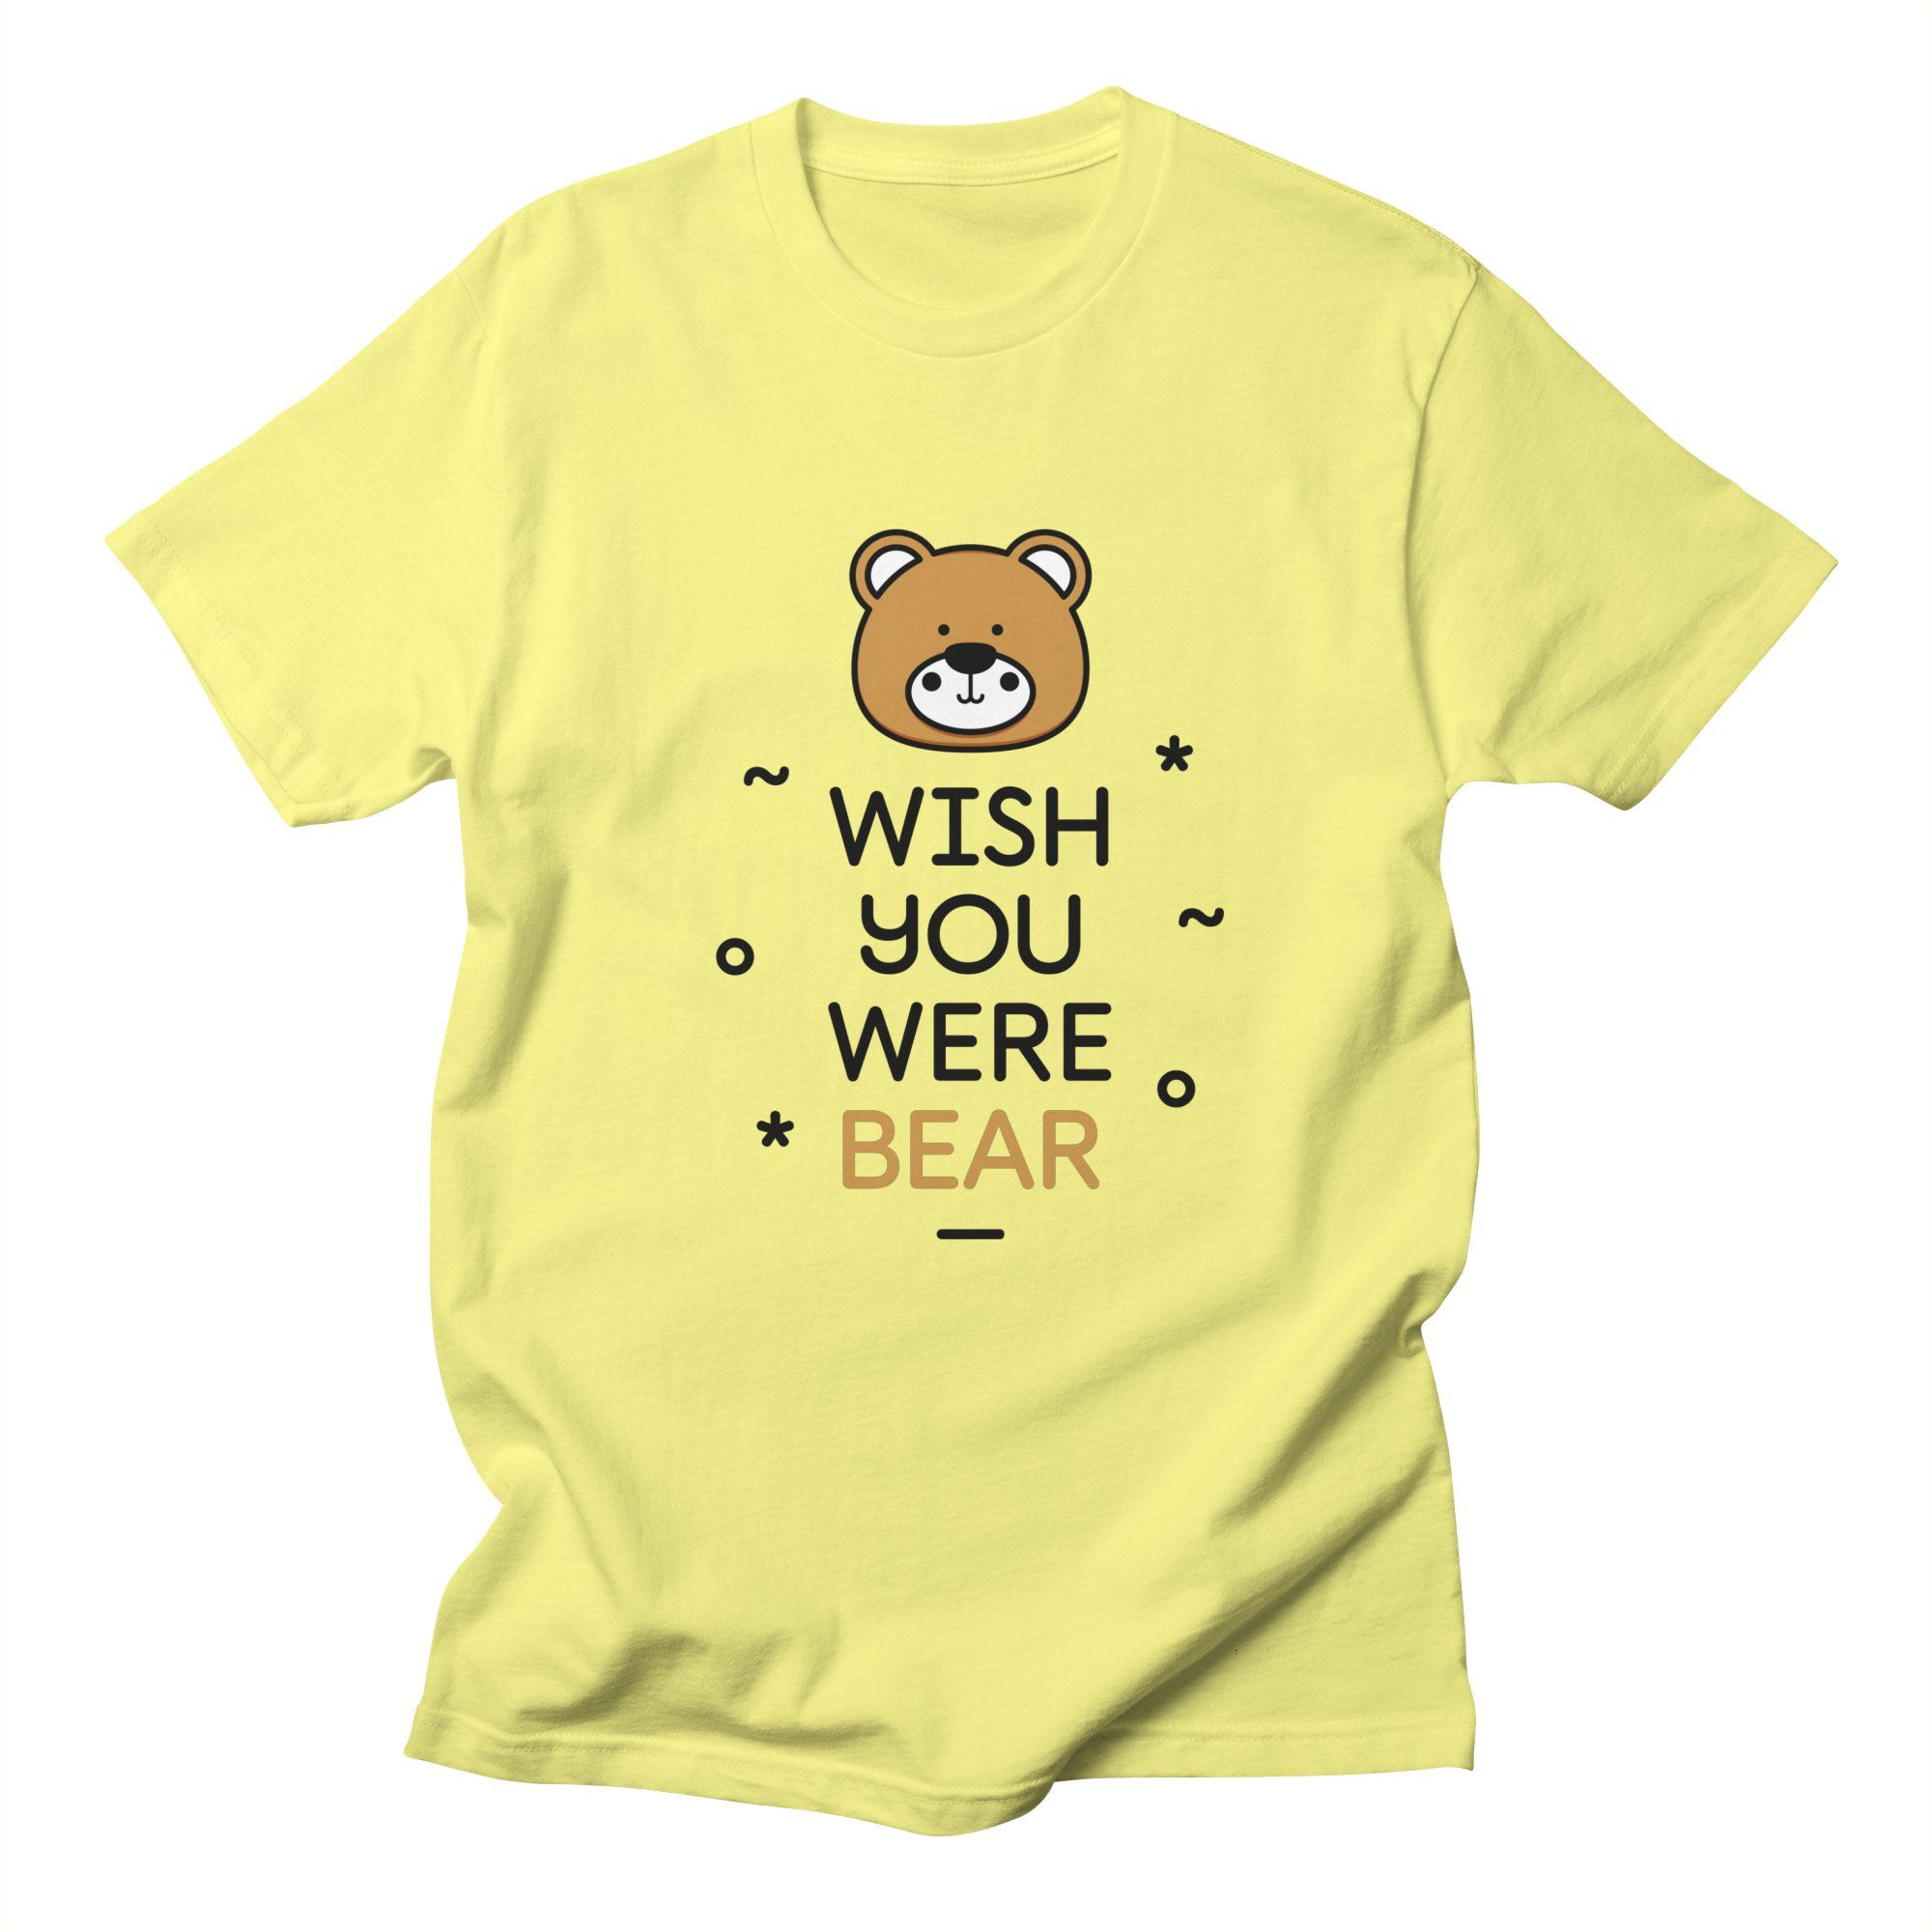 8ba04bf6 Wish You Were Bear Funny Quote T-Shirt | © MadeByBono Threadless ...